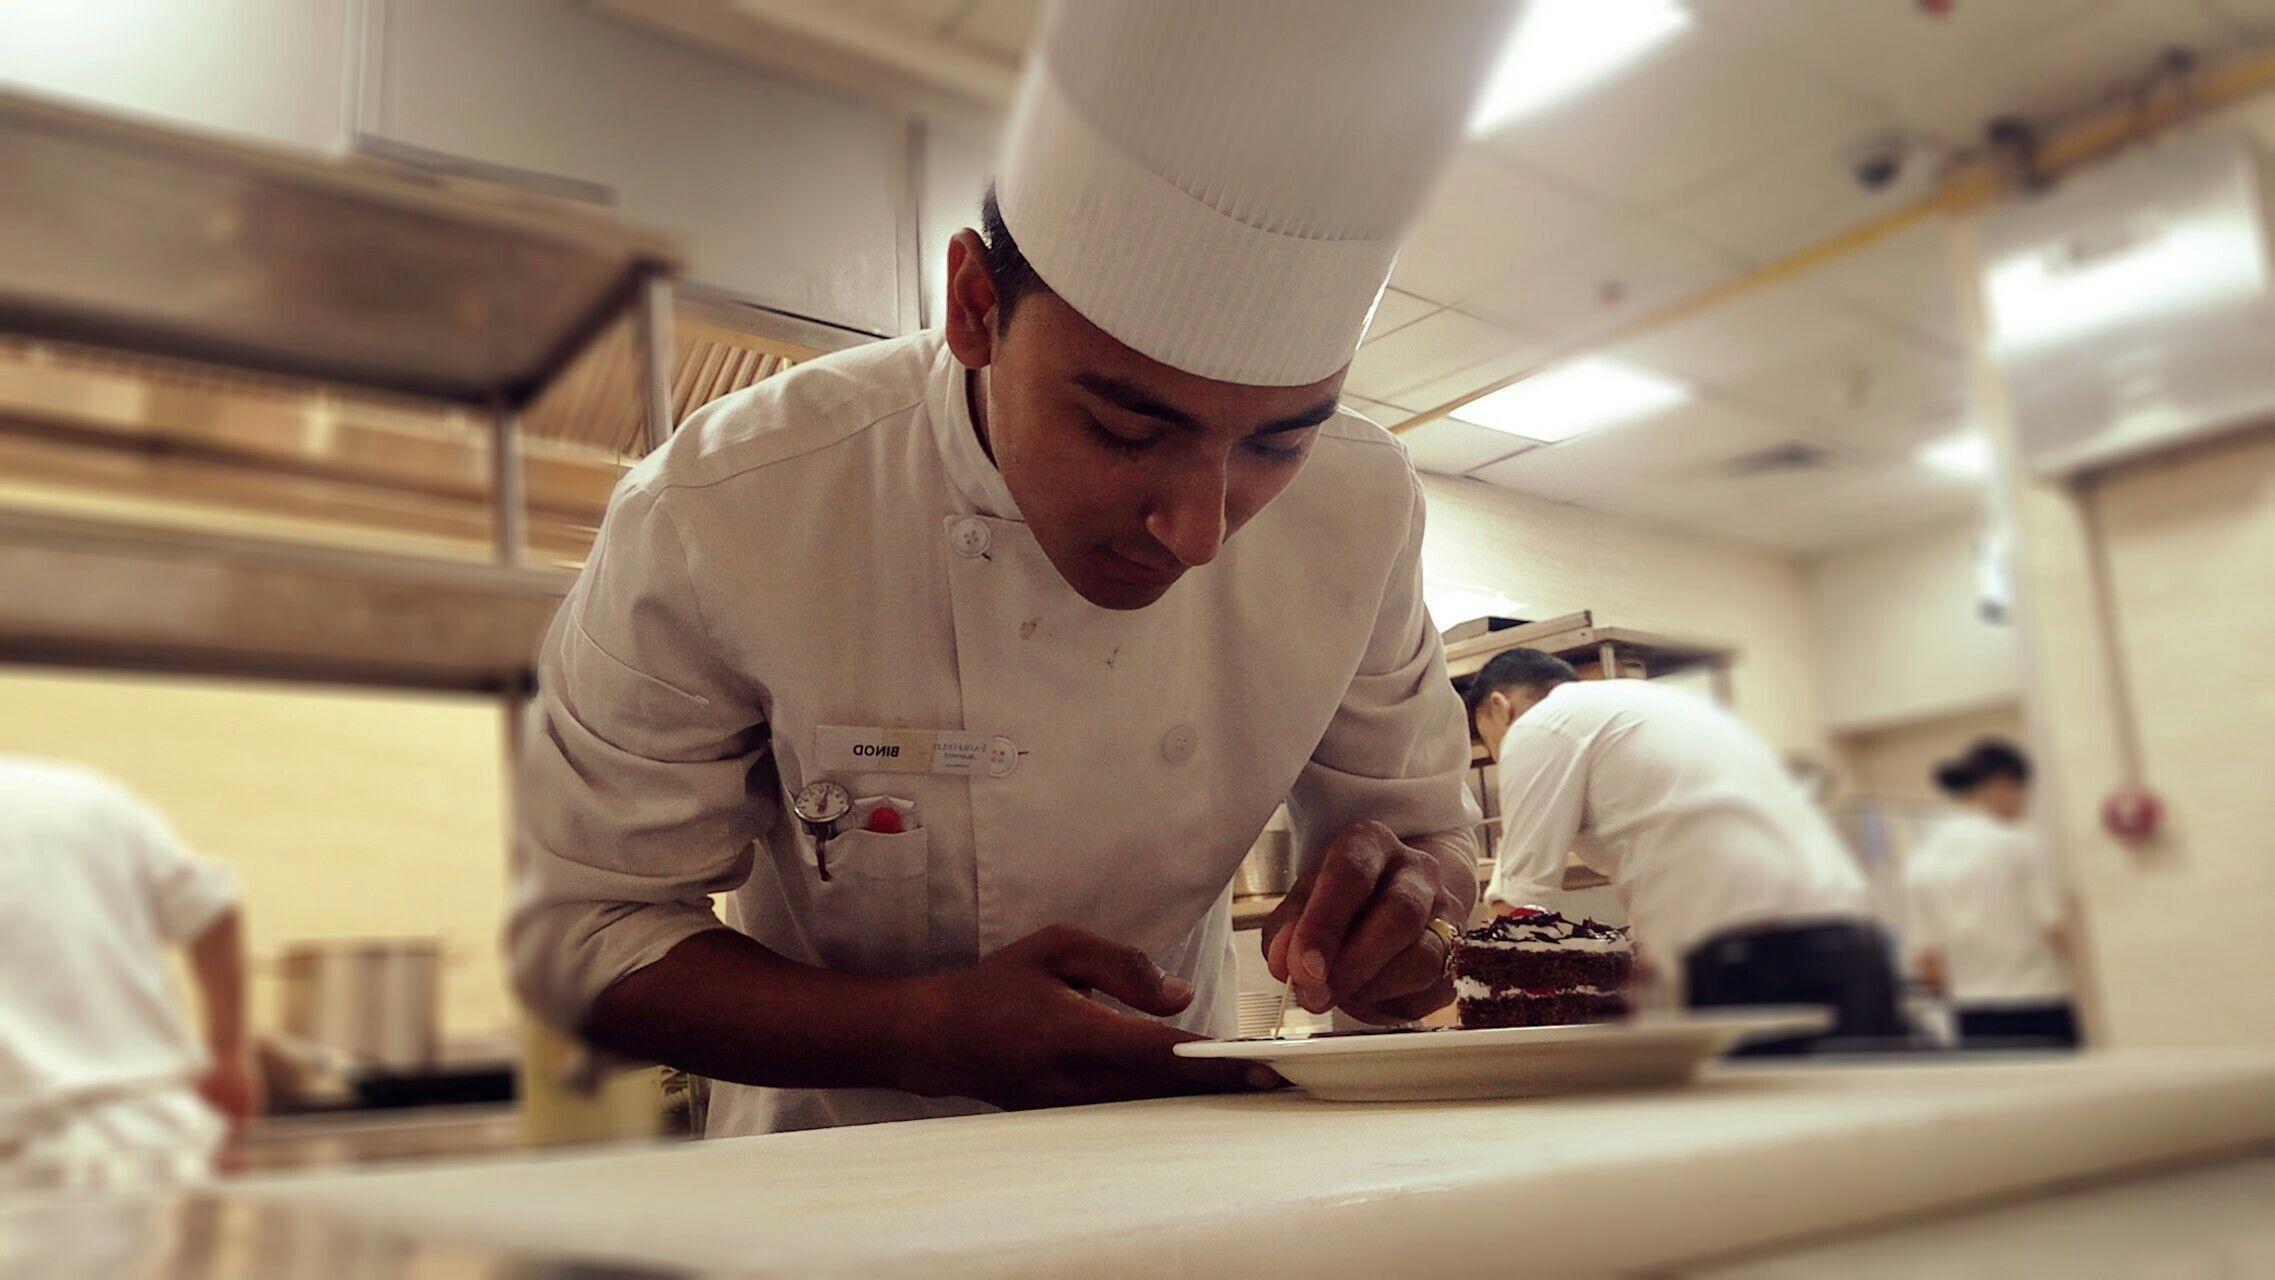 Decoration On Plate Chef Duwal Binod Chef Jackets Decor Plates